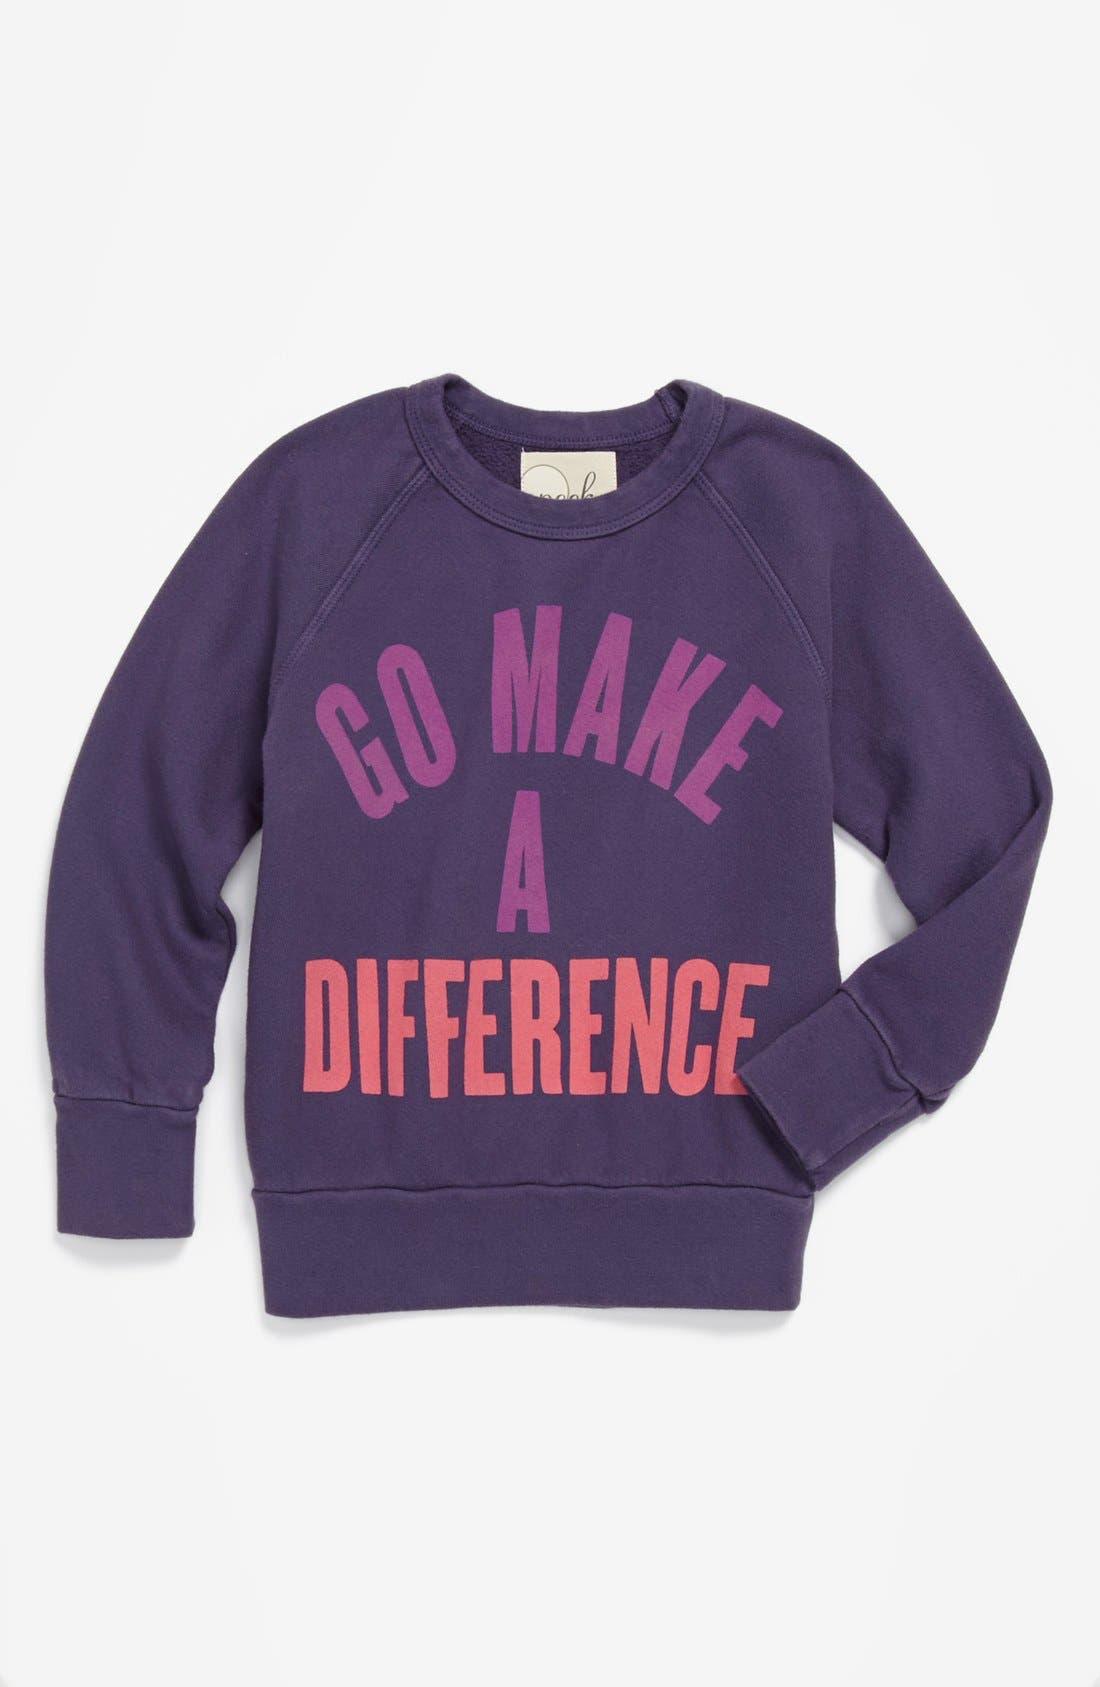 Alternate Image 1 Selected - Peek 'Go Make a Difference' Sweatshirt (Toddler Girls, Little Girls & Big Girls)